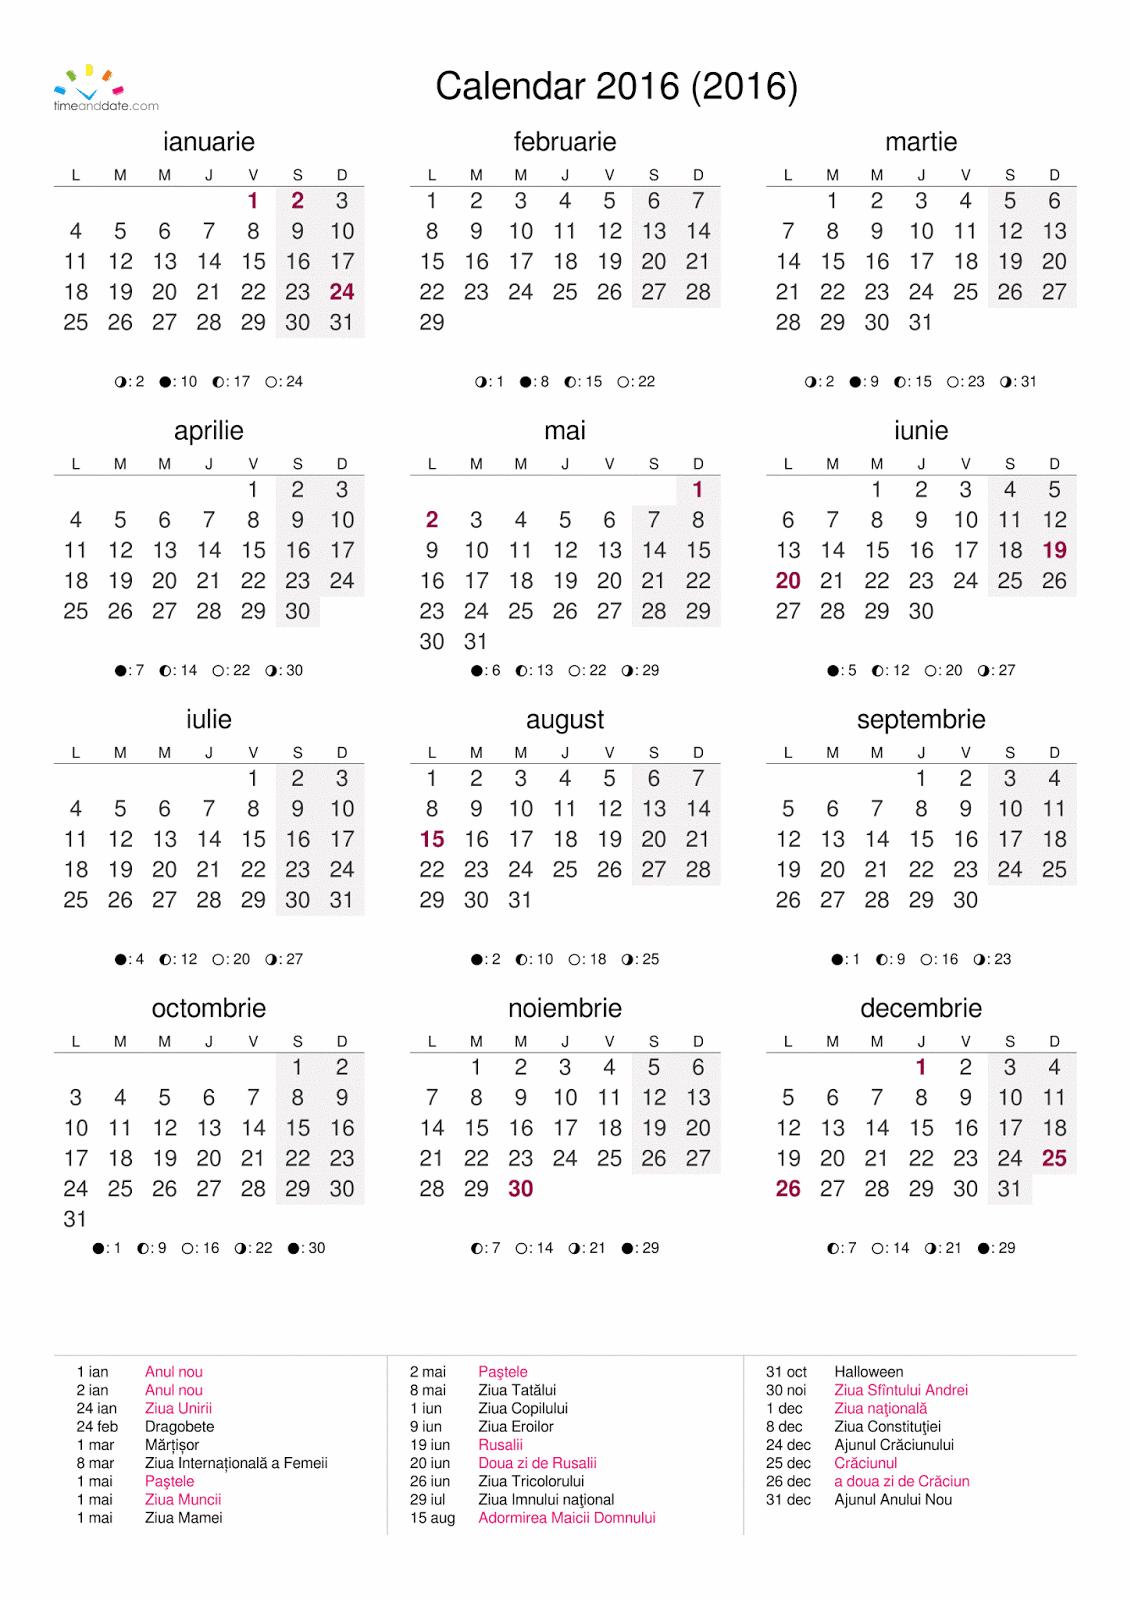 Calendar 2016 Romana | Calendar Template 2016